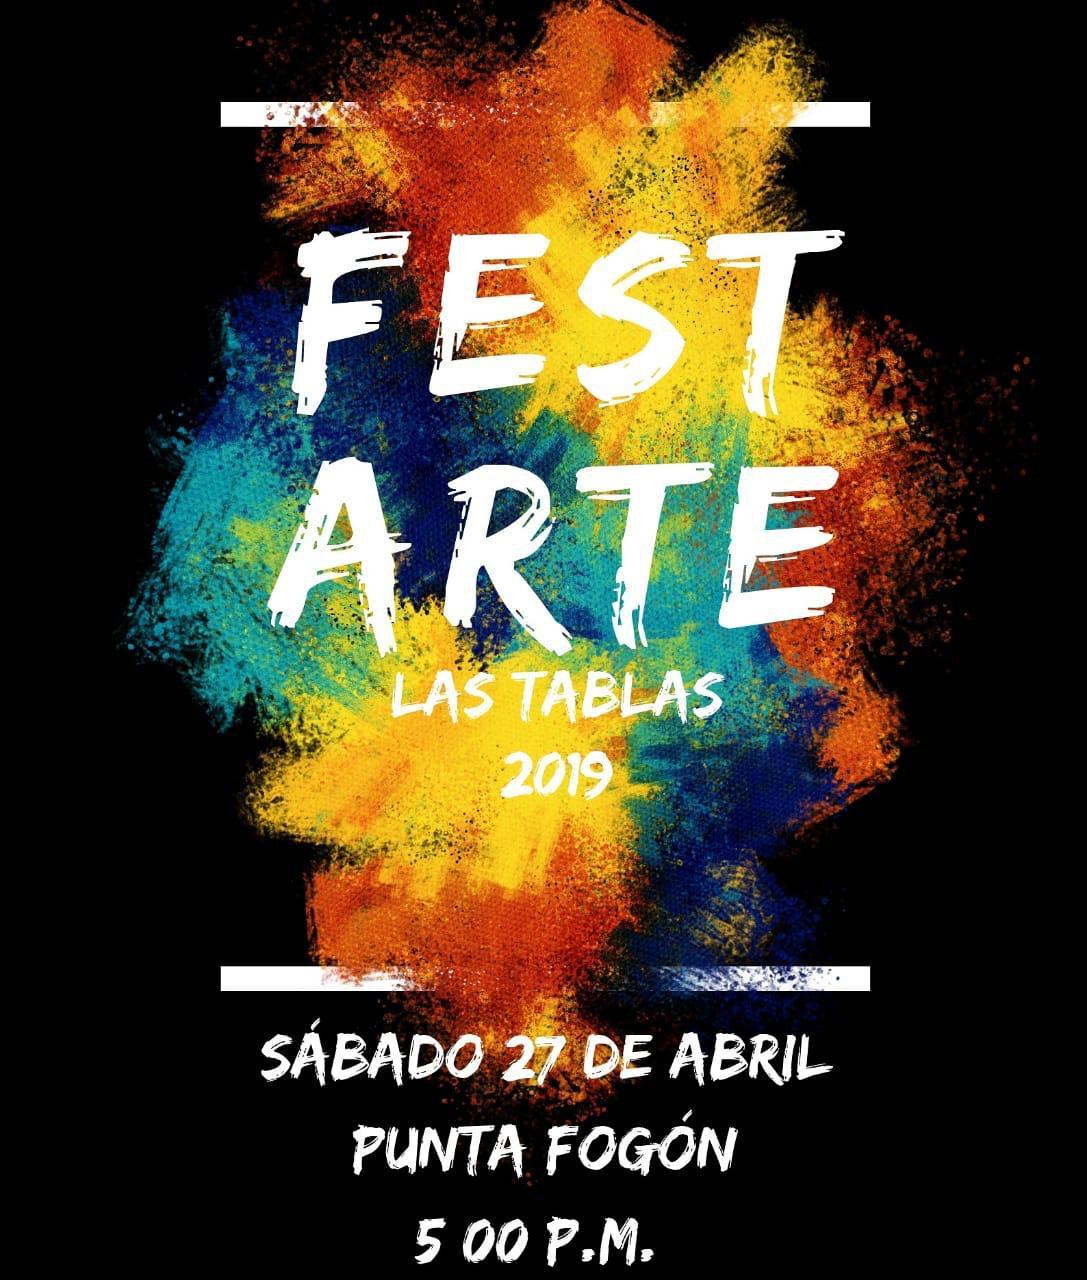 Fest Arte | My Guide Panama